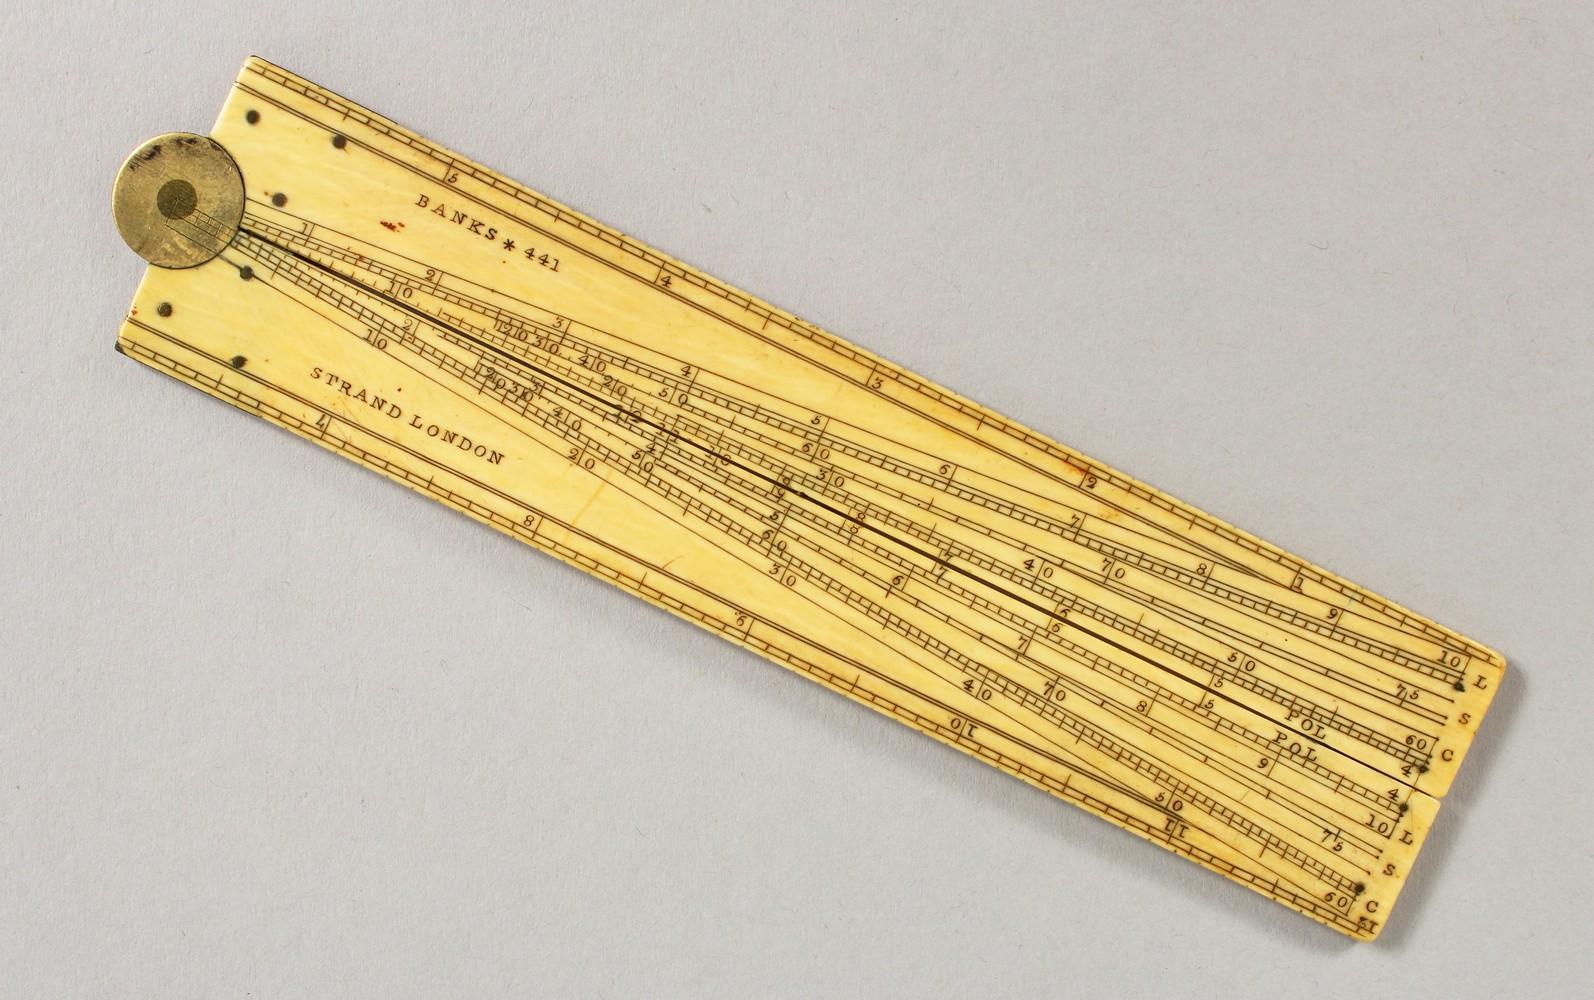 Lot 1772 - A BANKS OF LONDON 12-INCH FOLDING IVORY RULE.